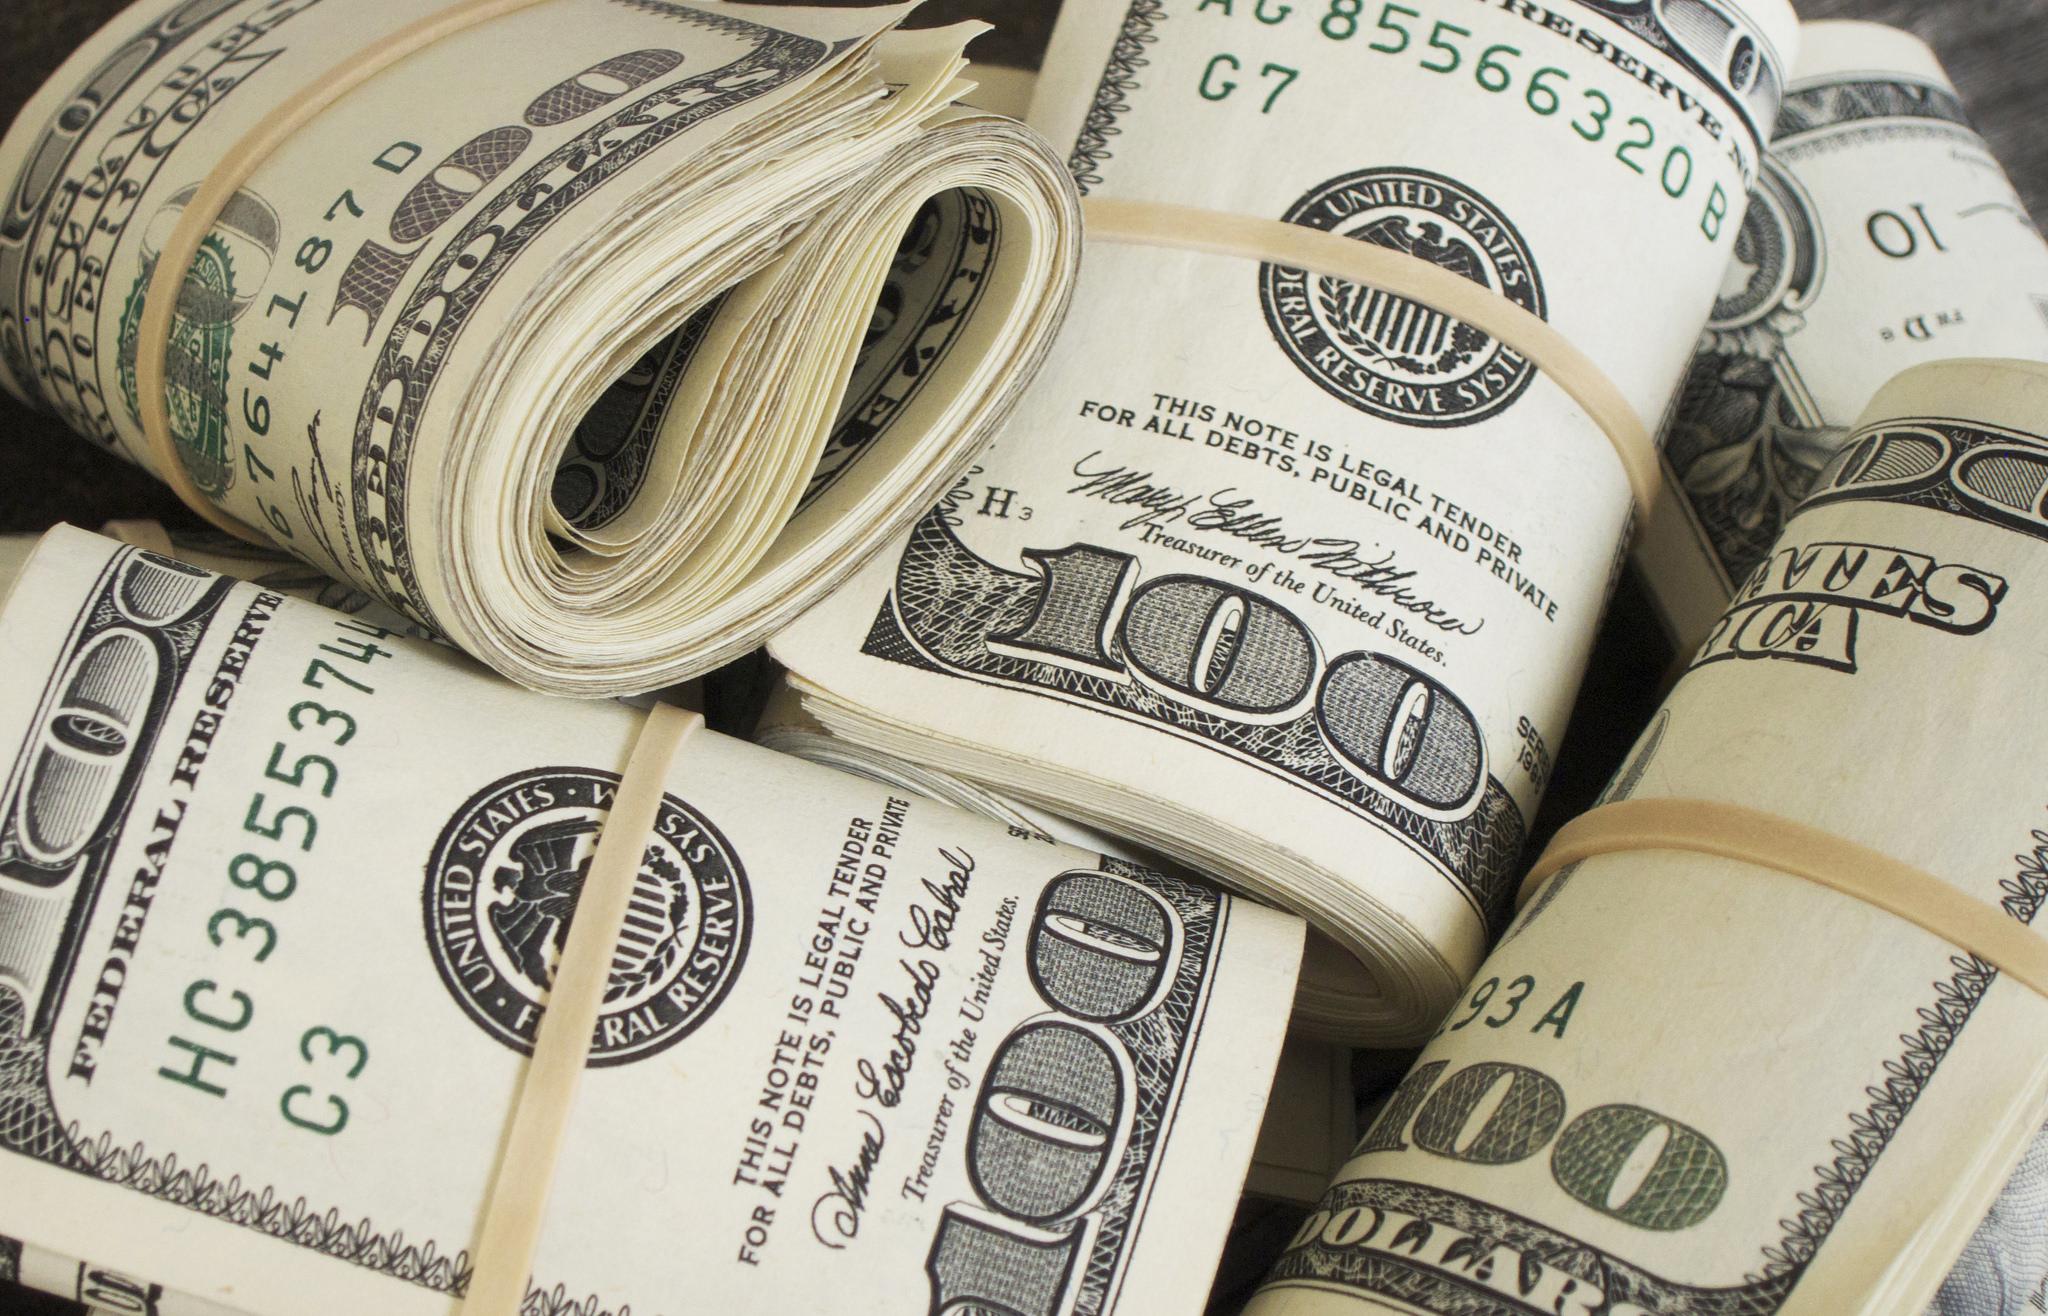 Money, Pictures of Money Auguest 2, 2014